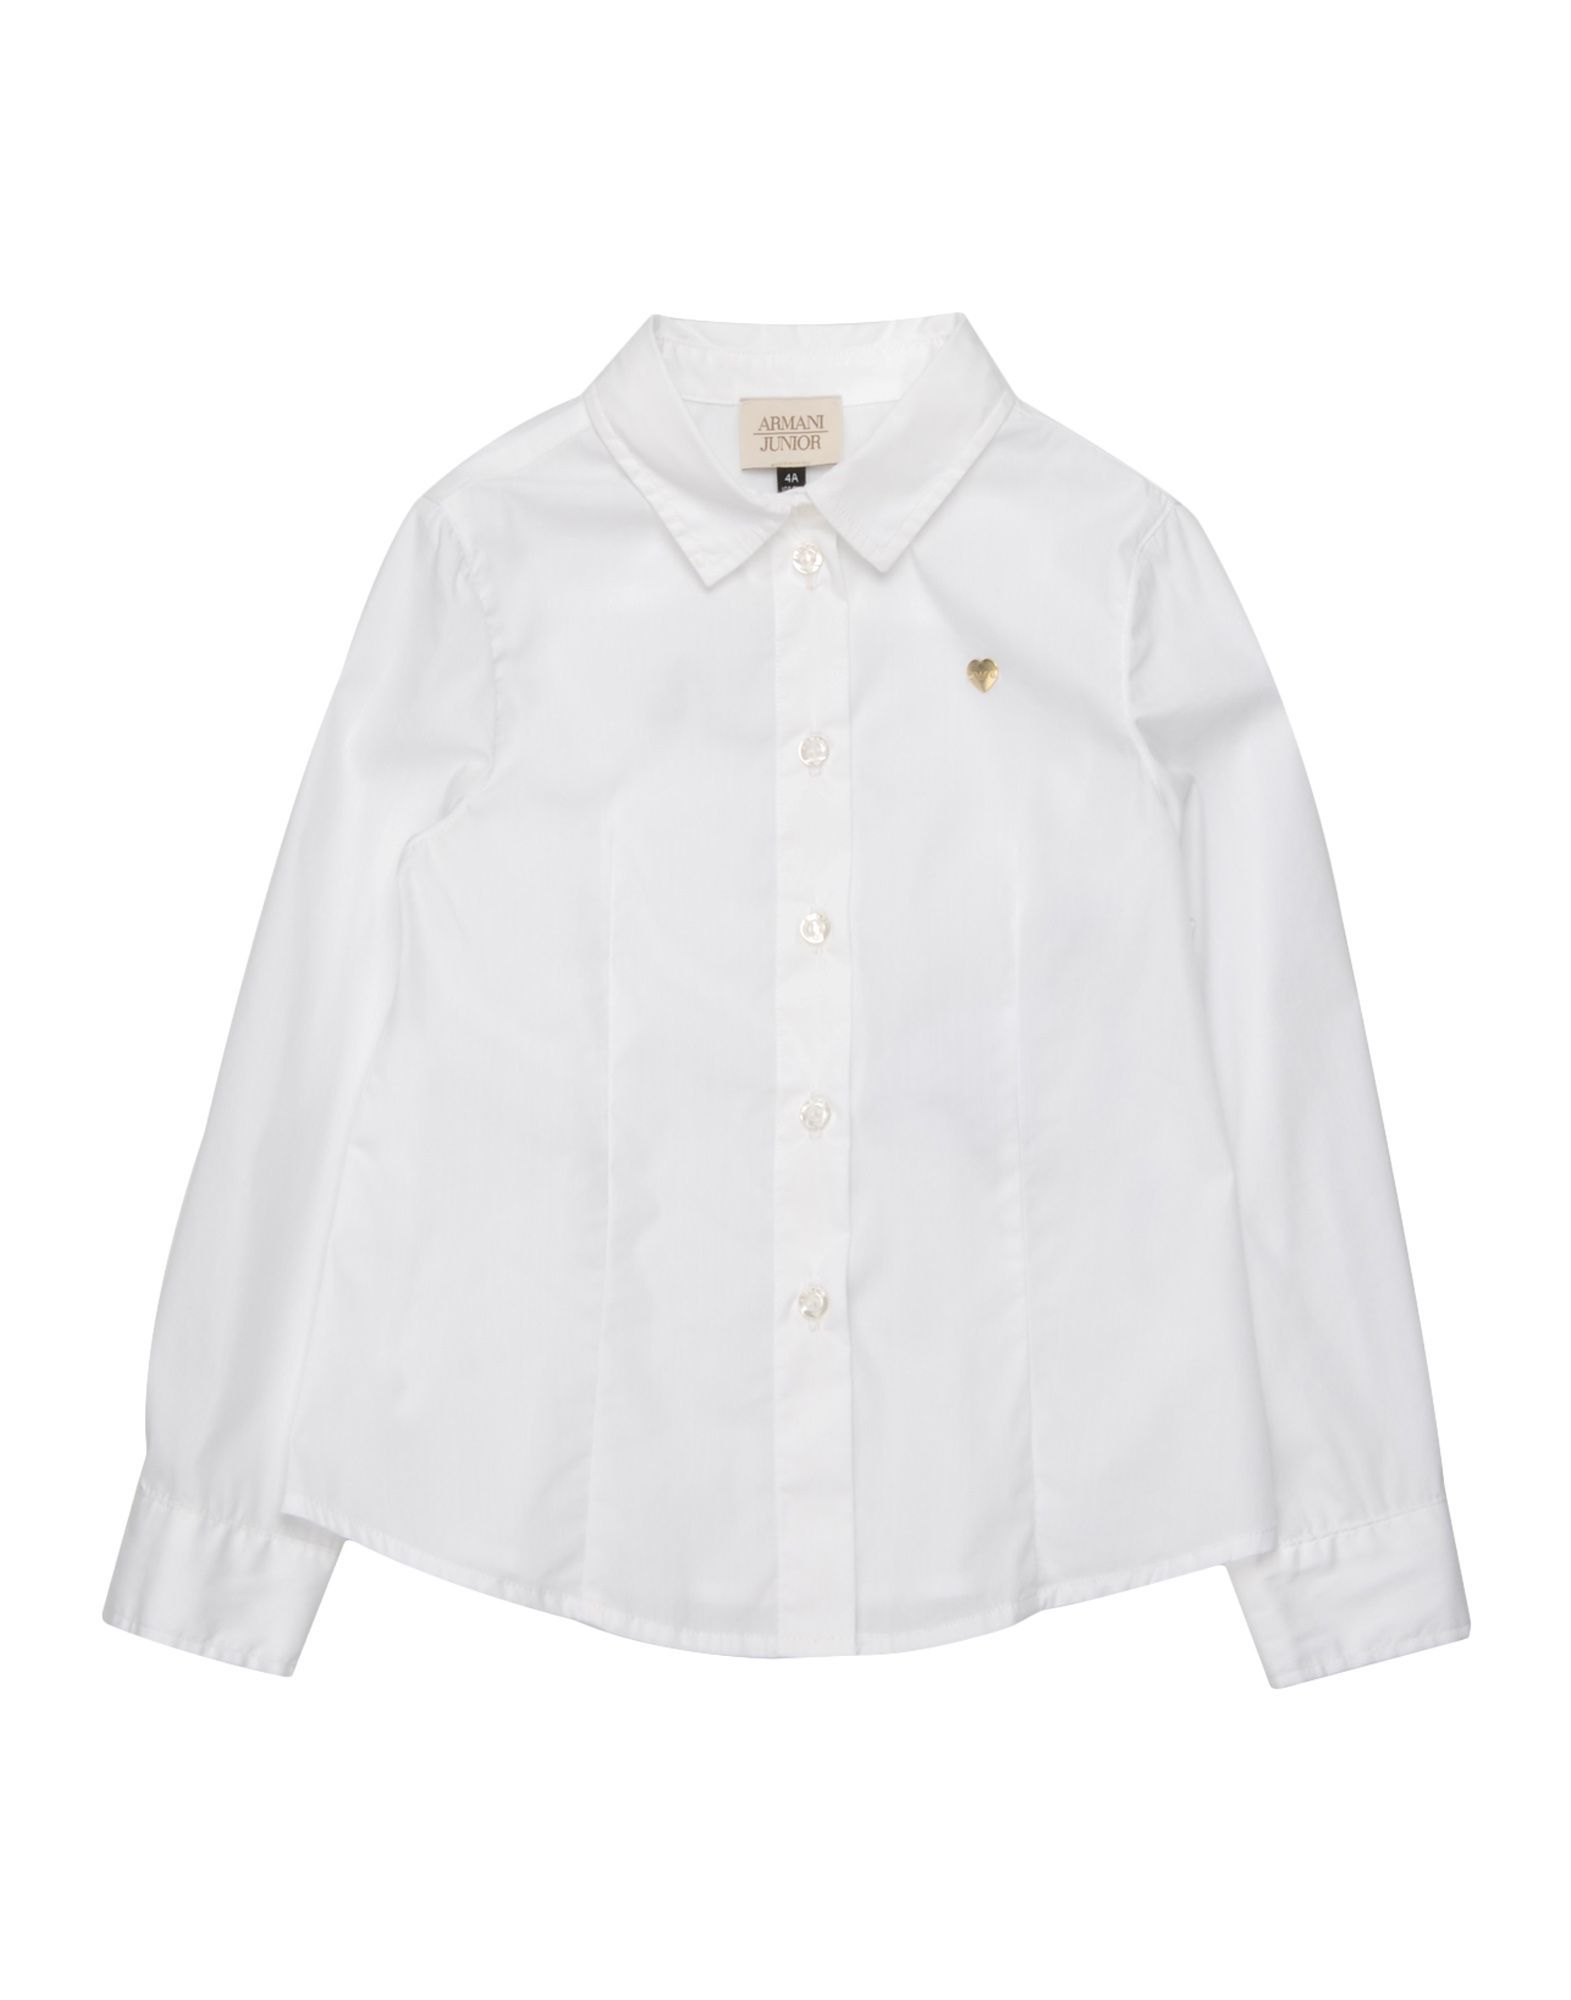 SHIRTS Armani Junior White Girl Cotton